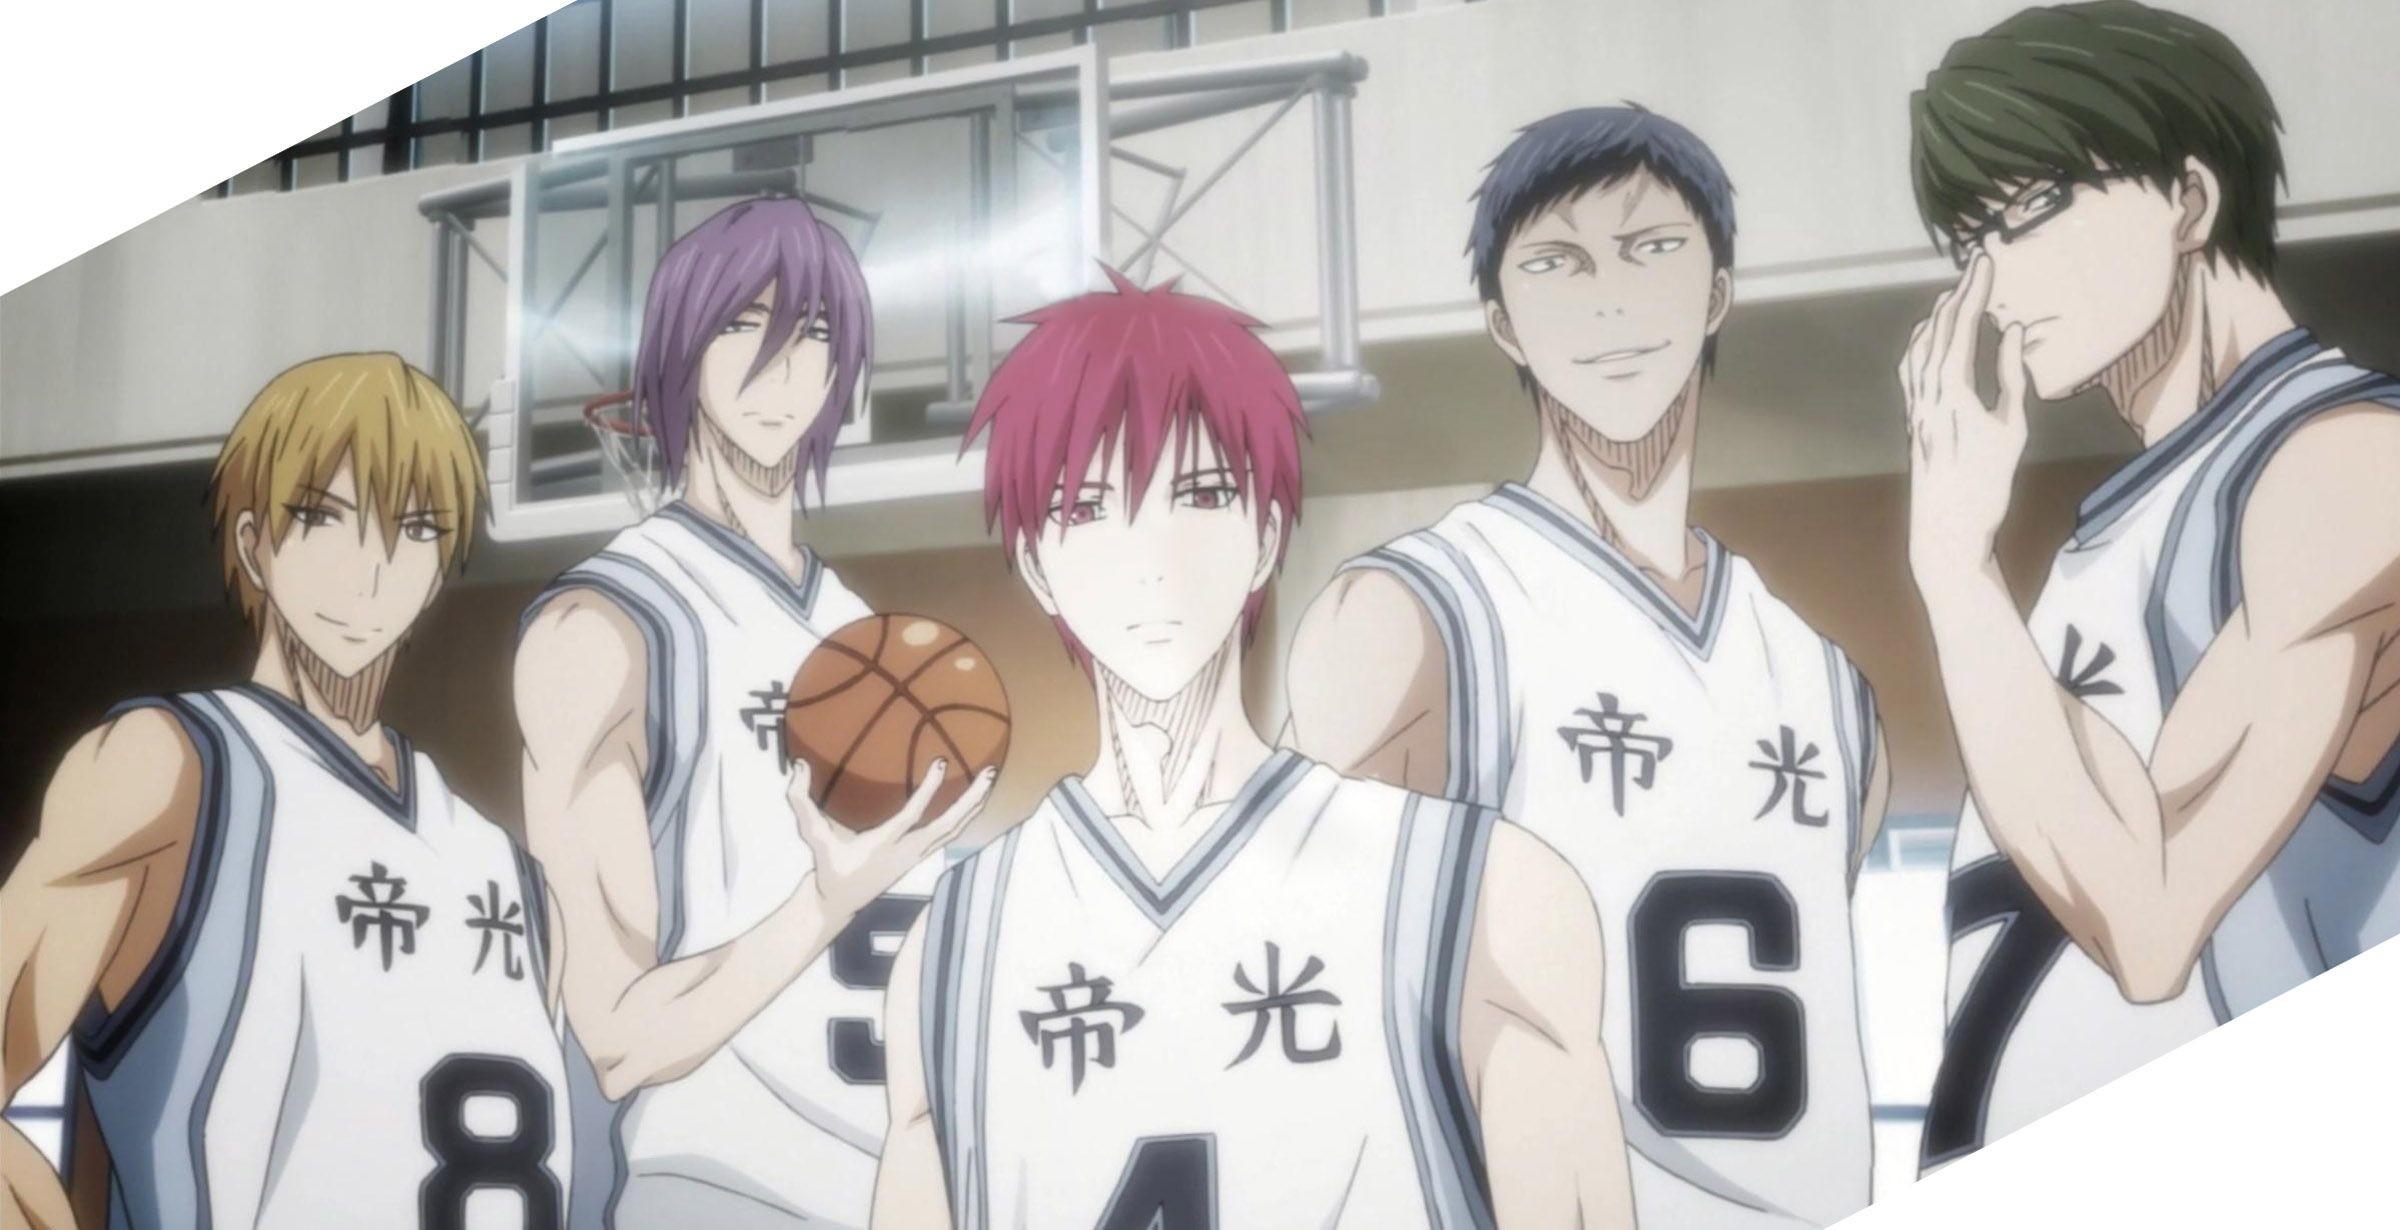 Res: 2400x1230, Generation of Miracles · Kuroko No BasketHd WallpaperCar WallpapersKuroko's  BasketballAnime ...